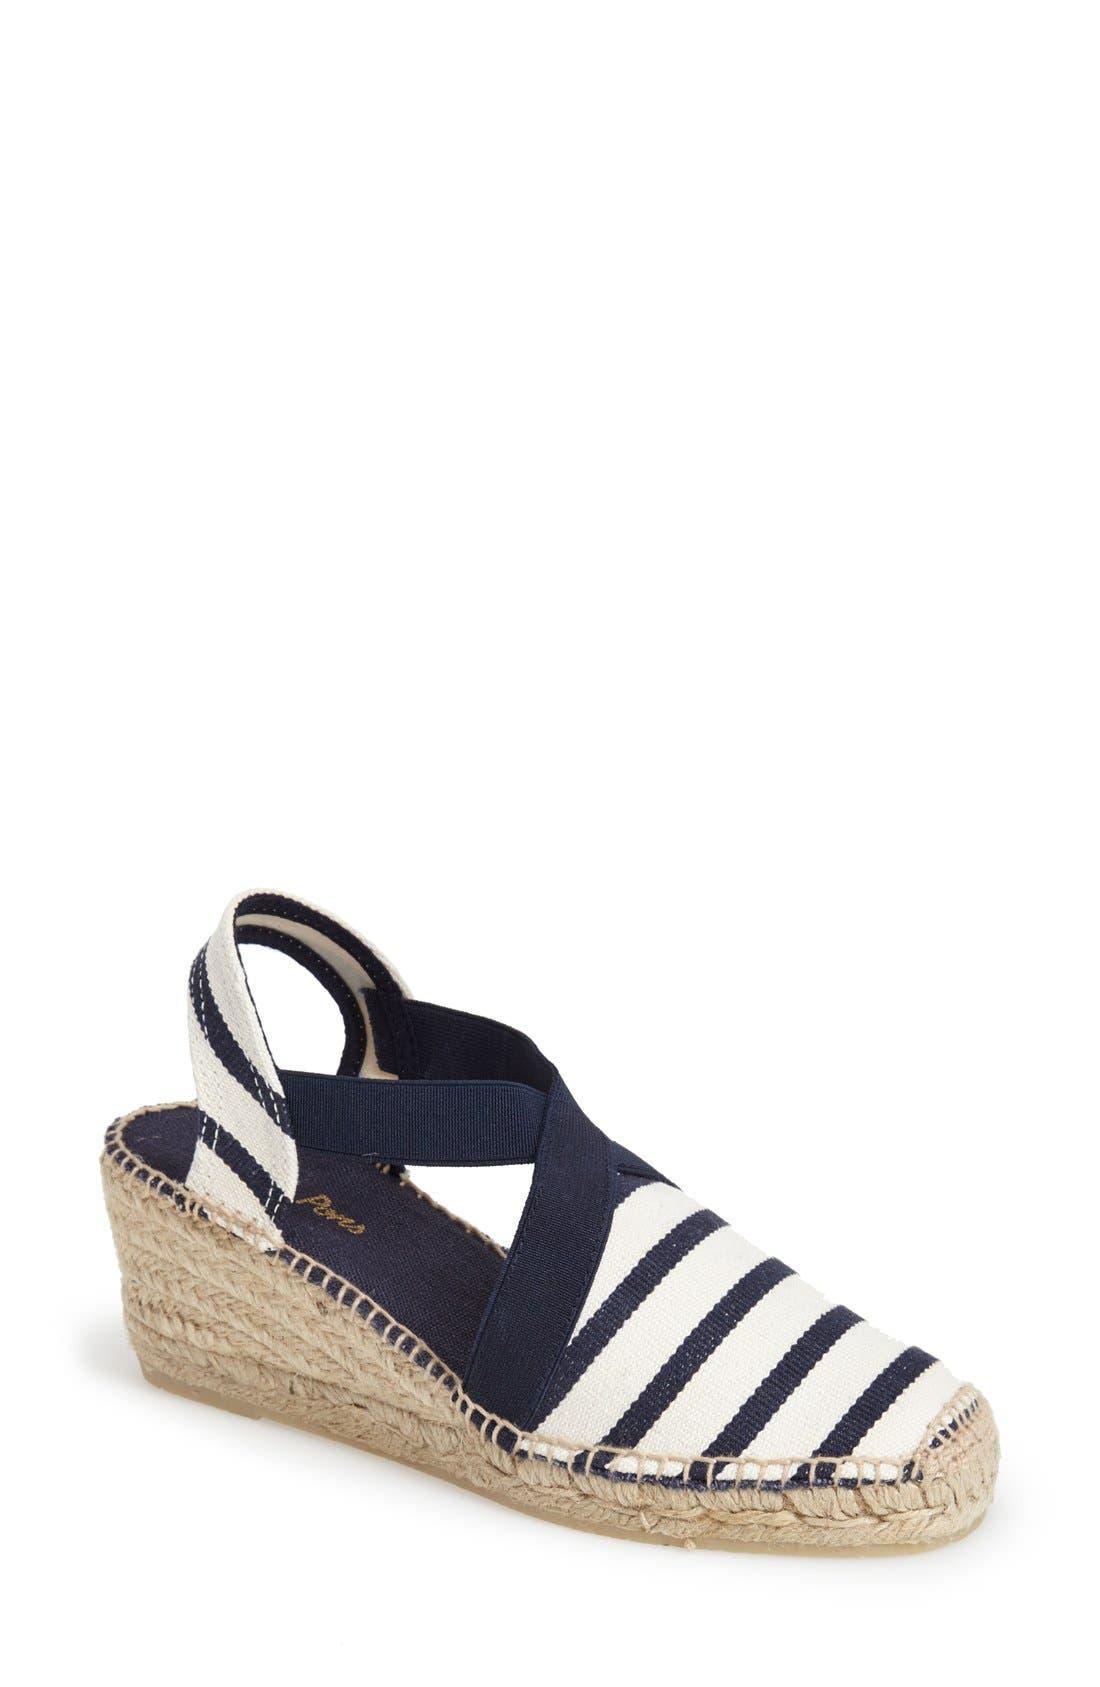 'Tarbes' Espadrille Wedge Sandal,                             Main thumbnail 1, color,                             BLUE